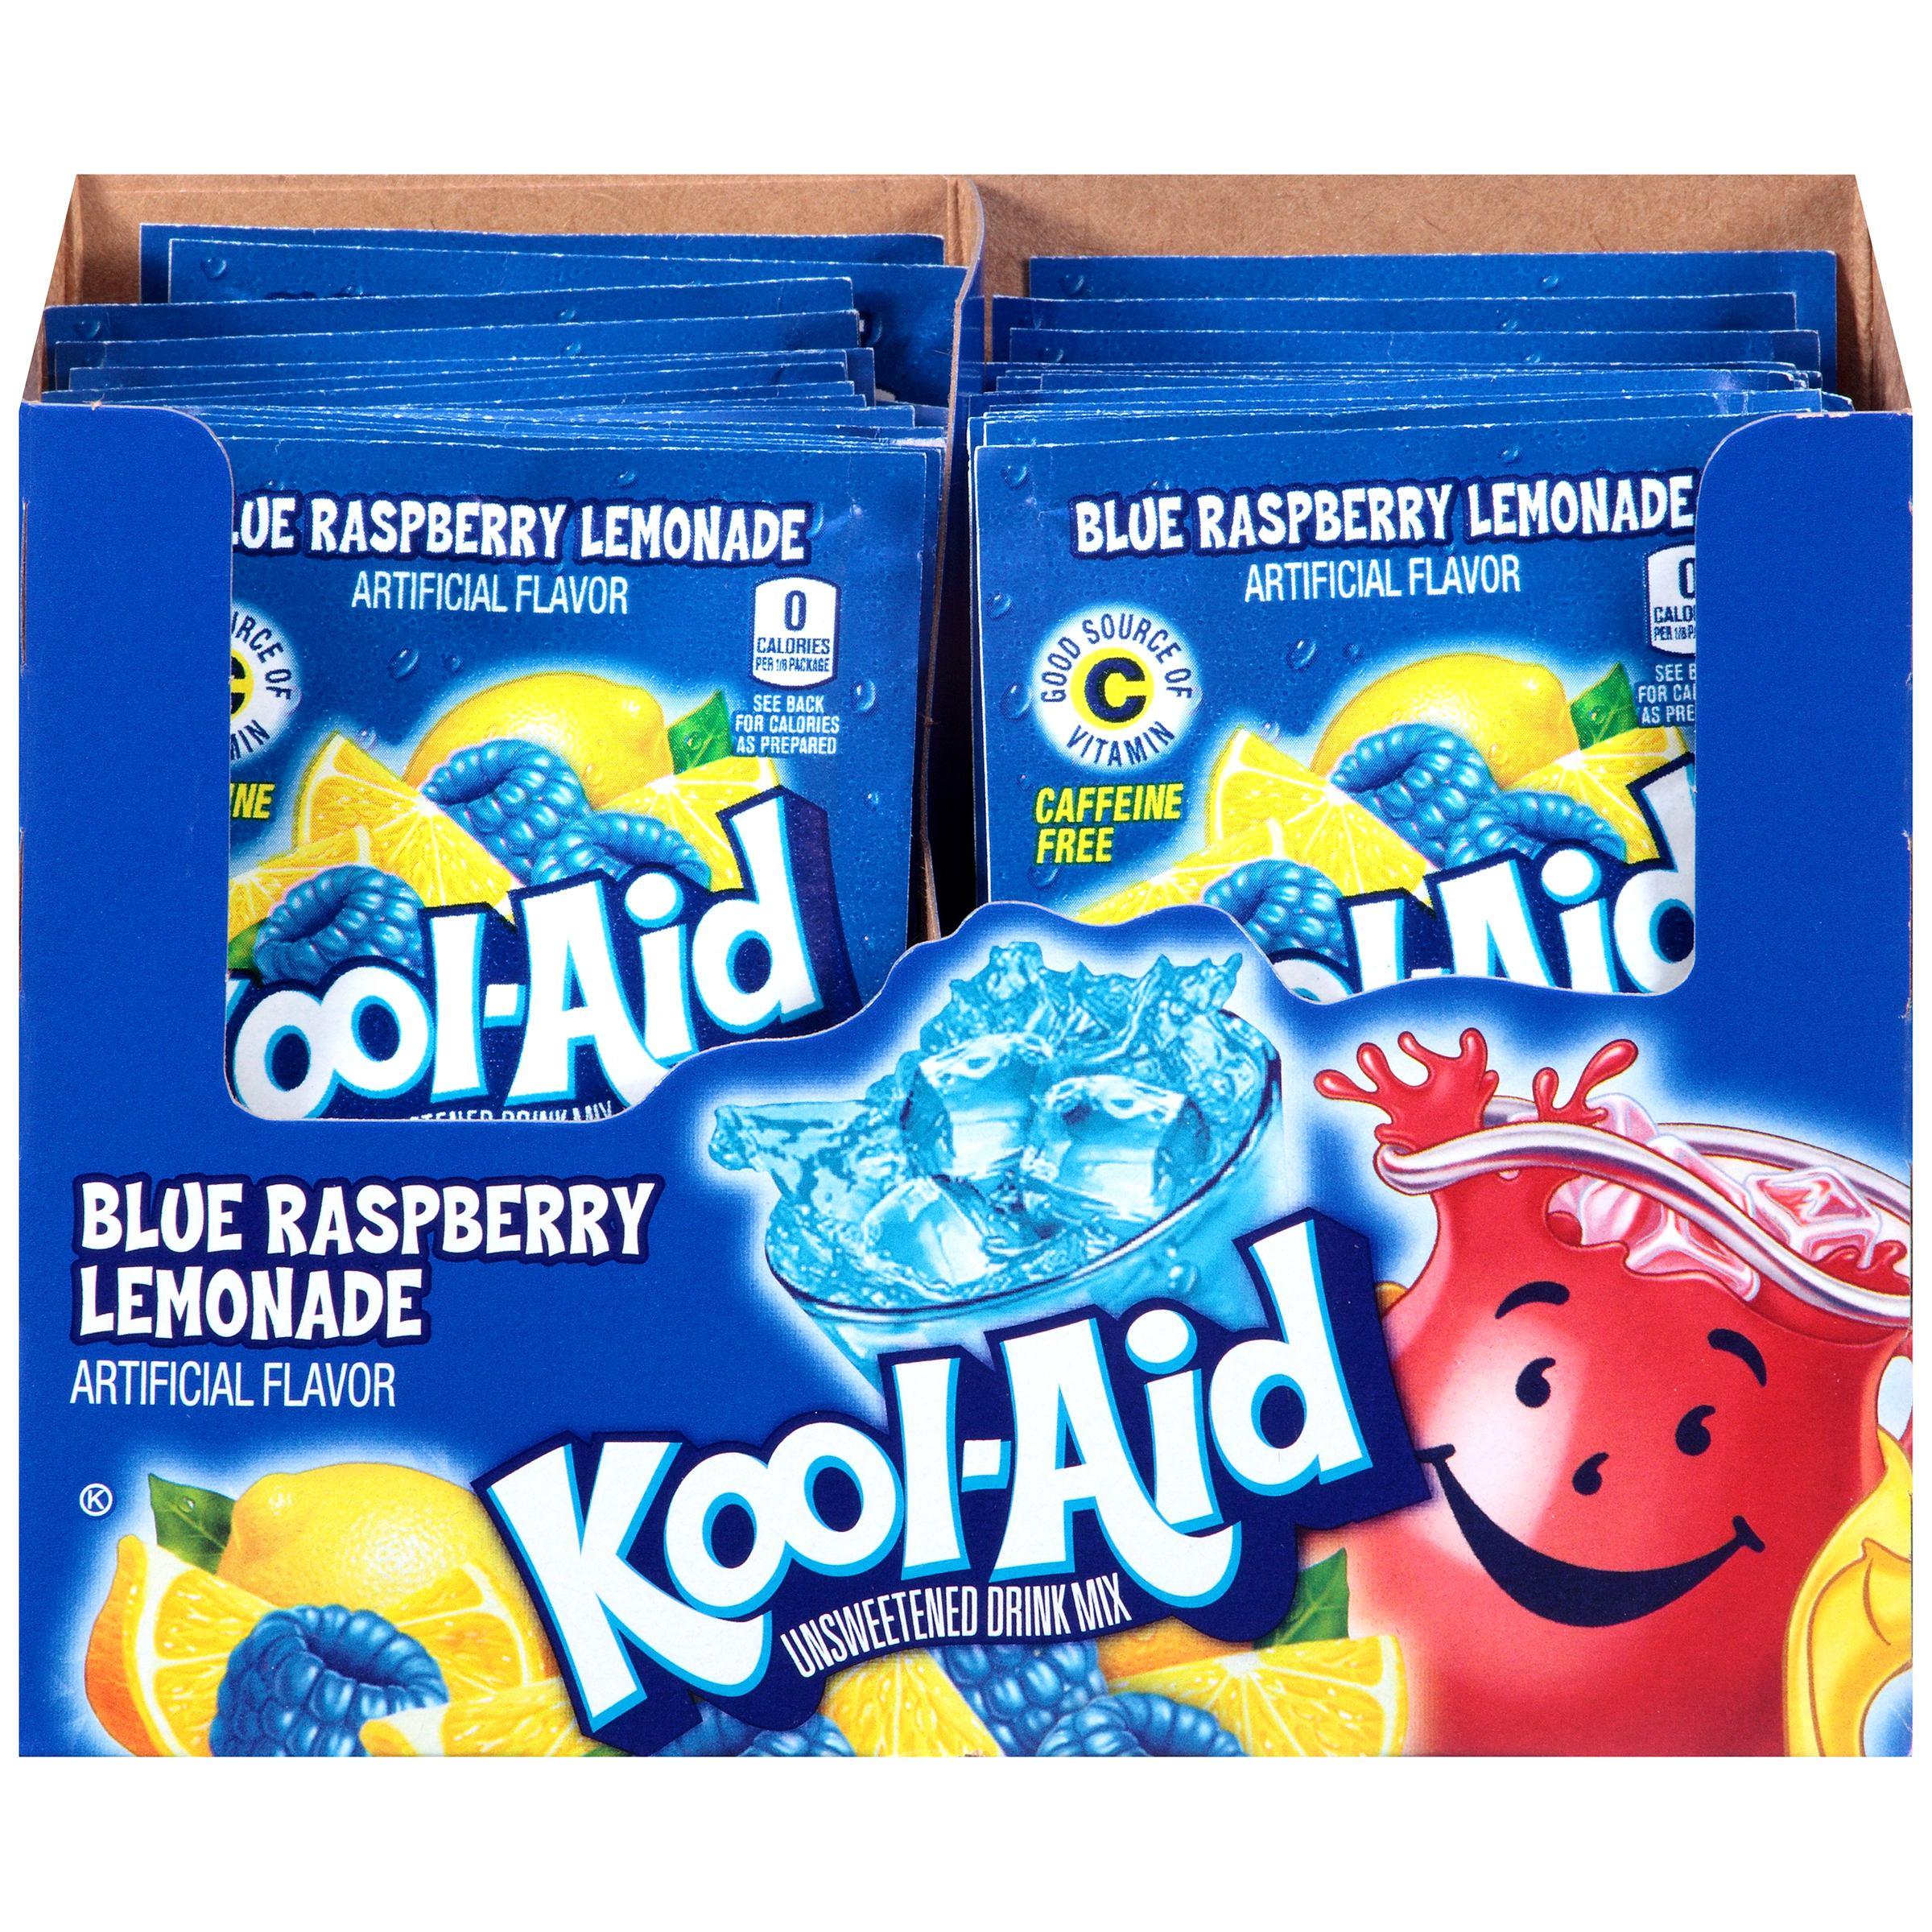 Kool-Aid Drink Mix, Raspberry Lemonade, .22 Oz, 1 Count - Walmart.com